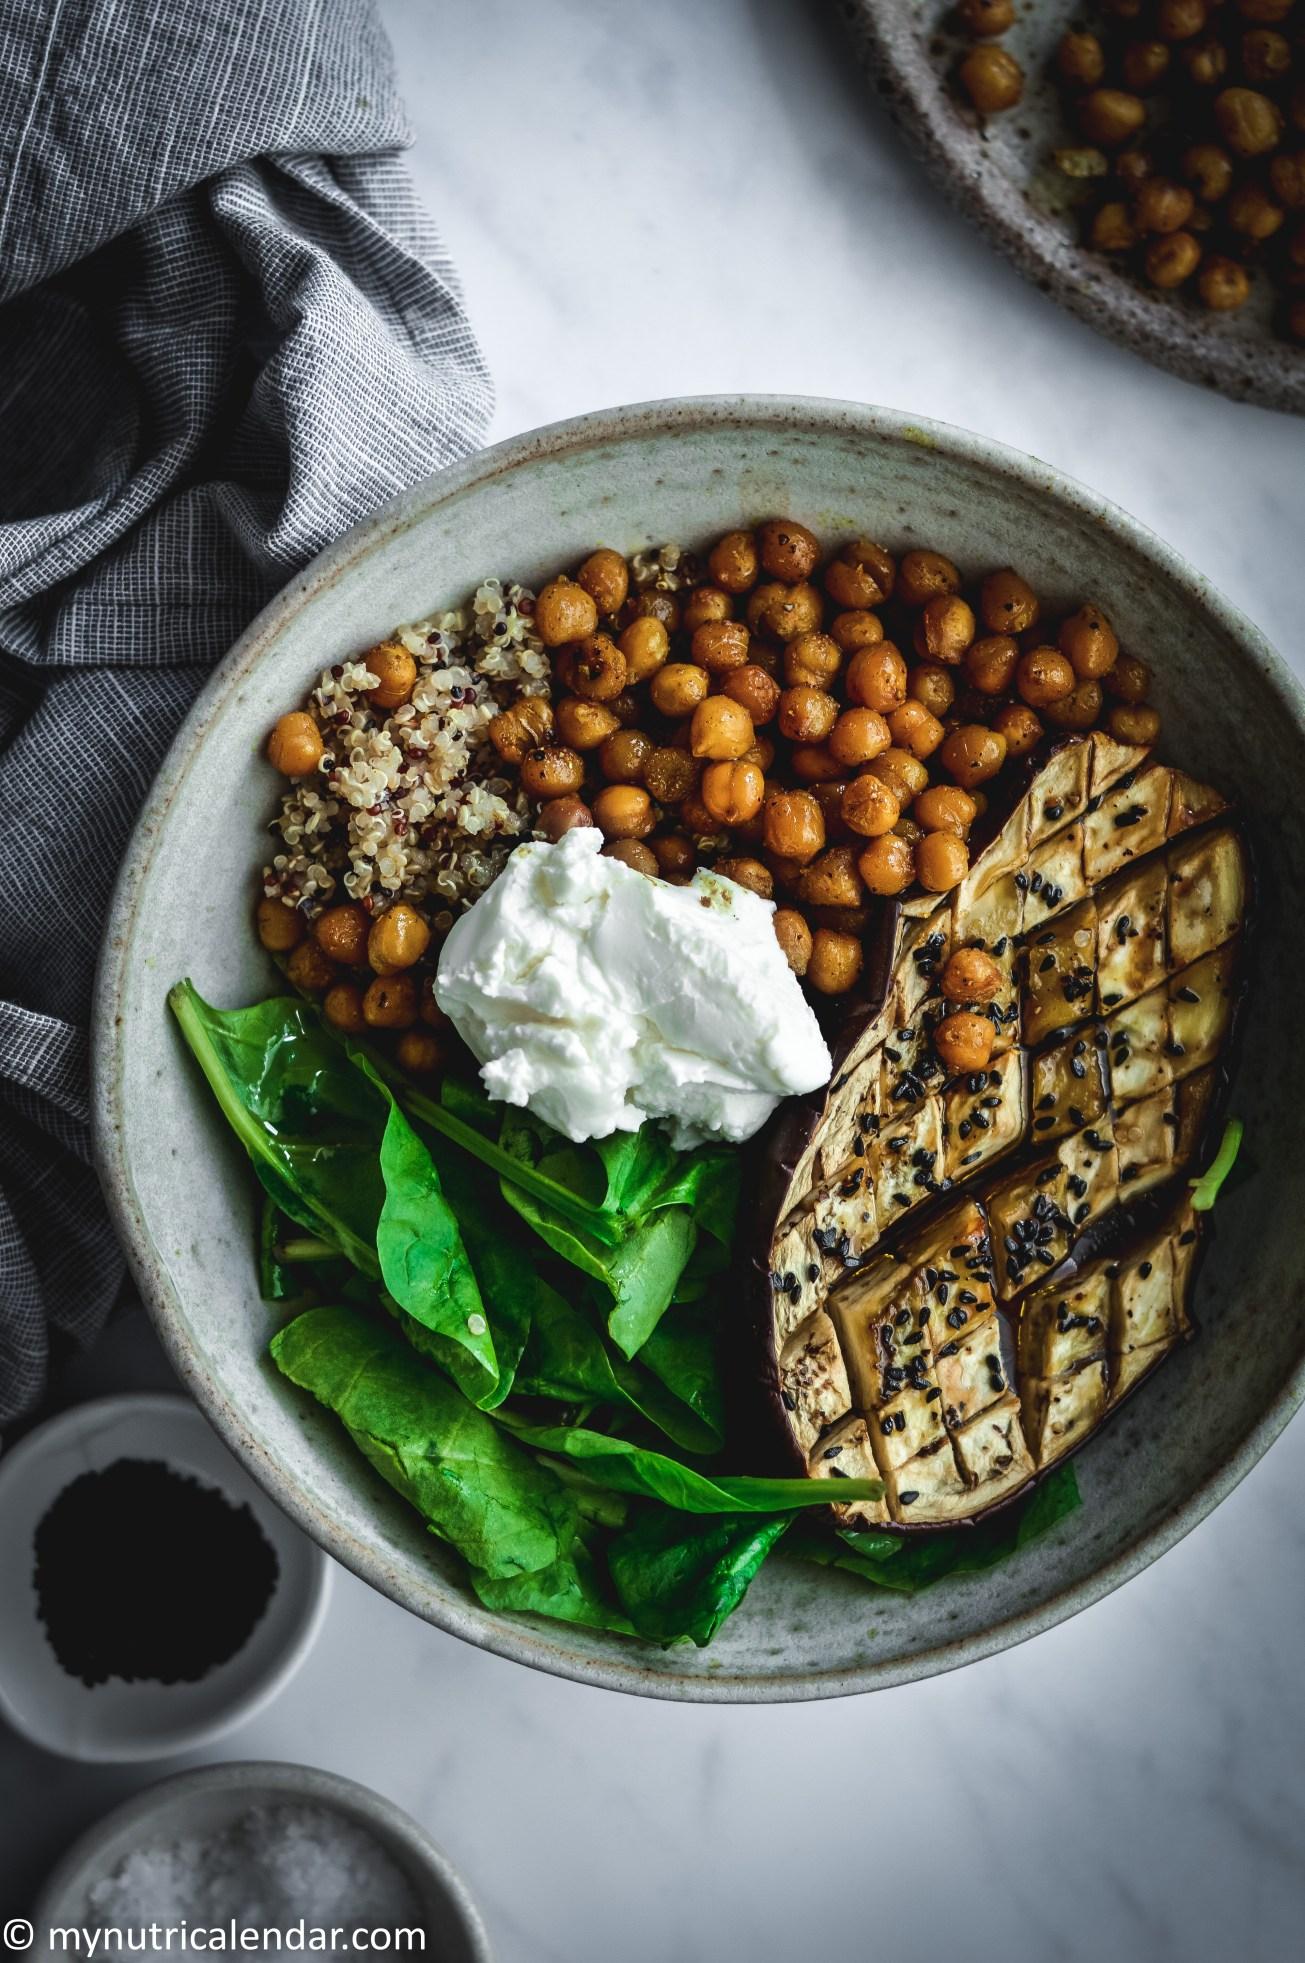 honey roast aubergine crispy cuurry chickpeas quinoa salad bowl 4.jpg